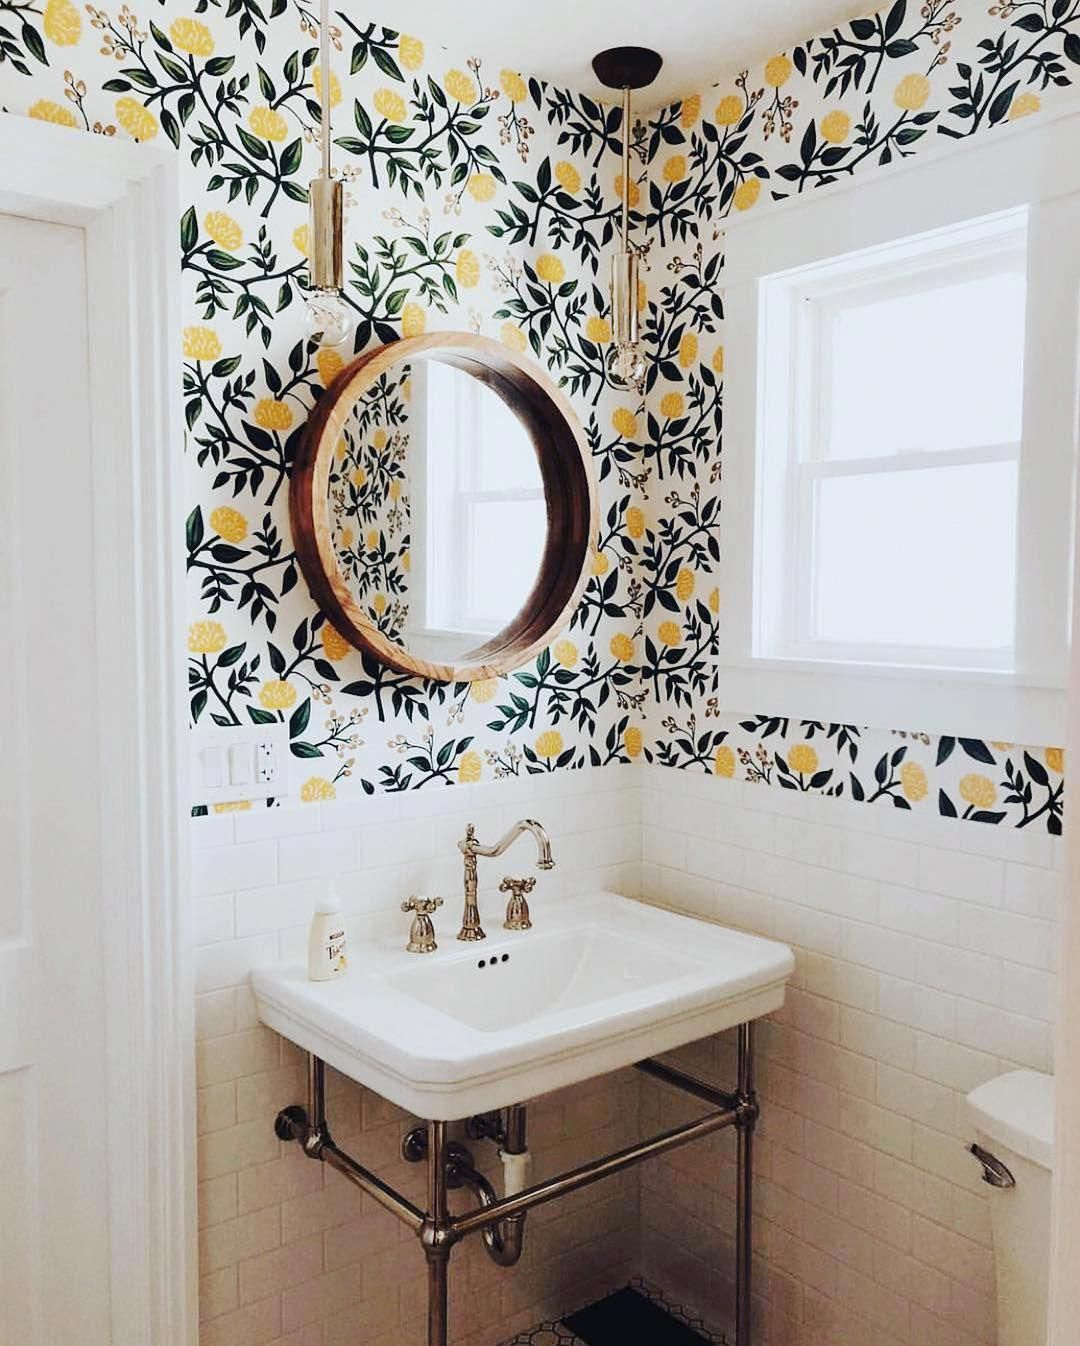 Homedesign Home Wallpaper Small Bathroom Bathroom Decor